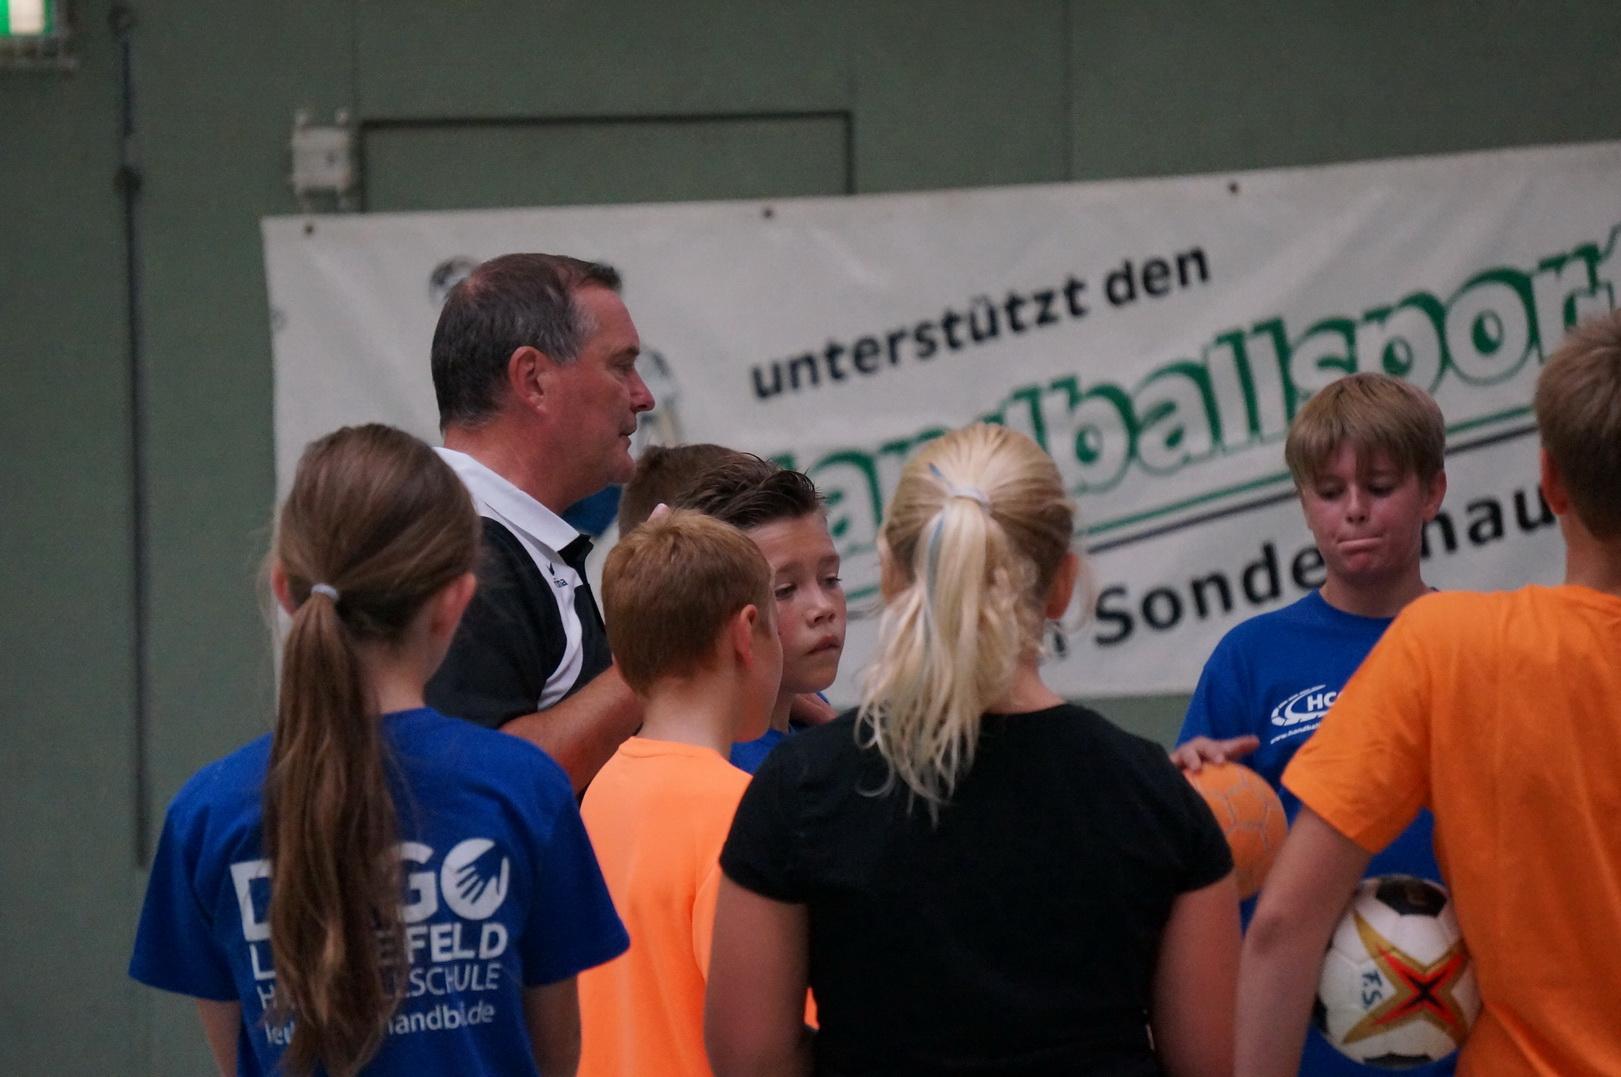 201808_Handballcamp_SDH_MG_152w